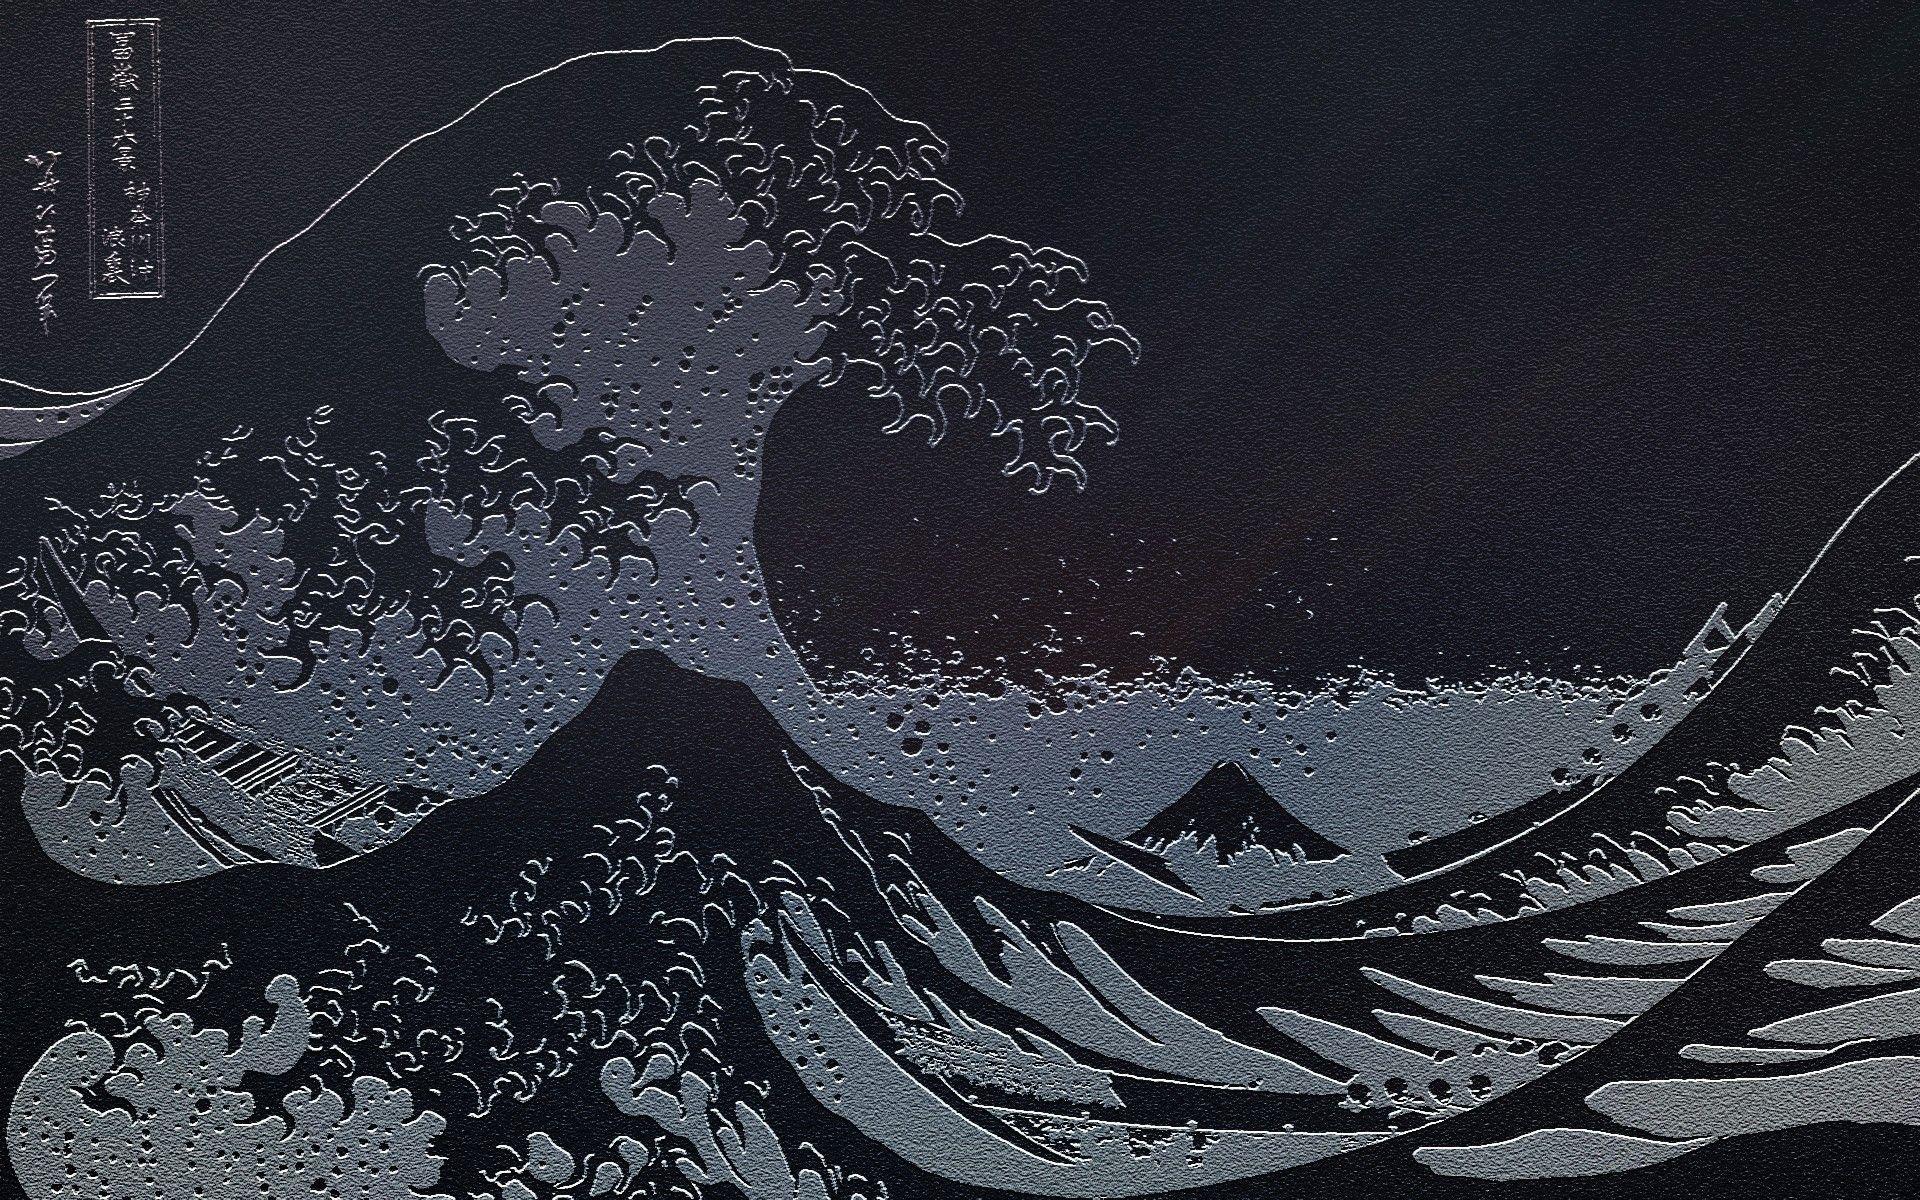 Japan Art Desktop Wallpapers - Wallpaper Cave